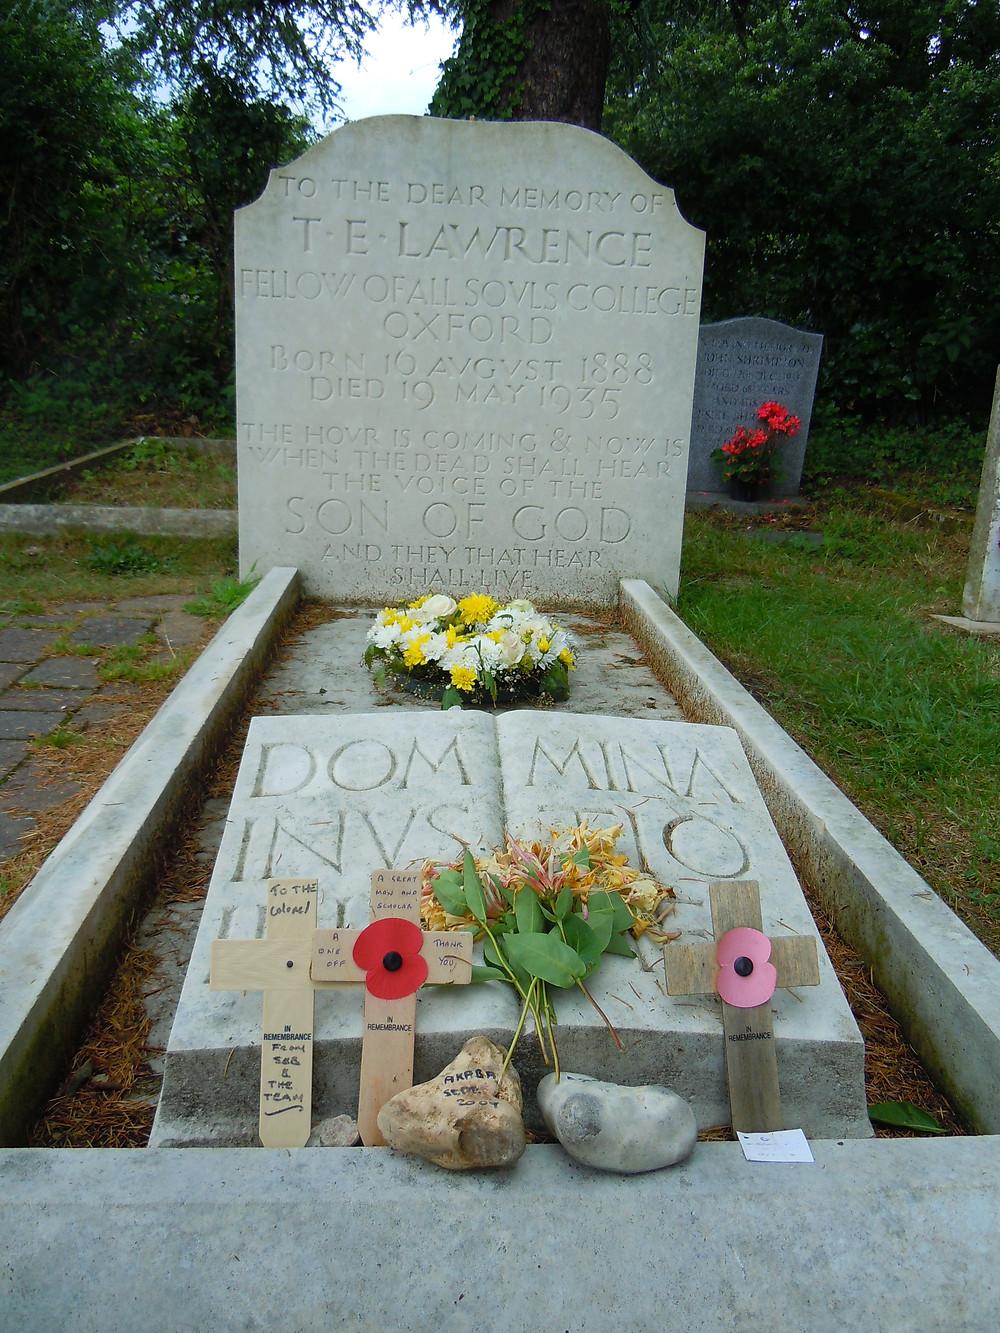 T.E Lawrence (Lawrence of Arabia) grave, Moreton Village